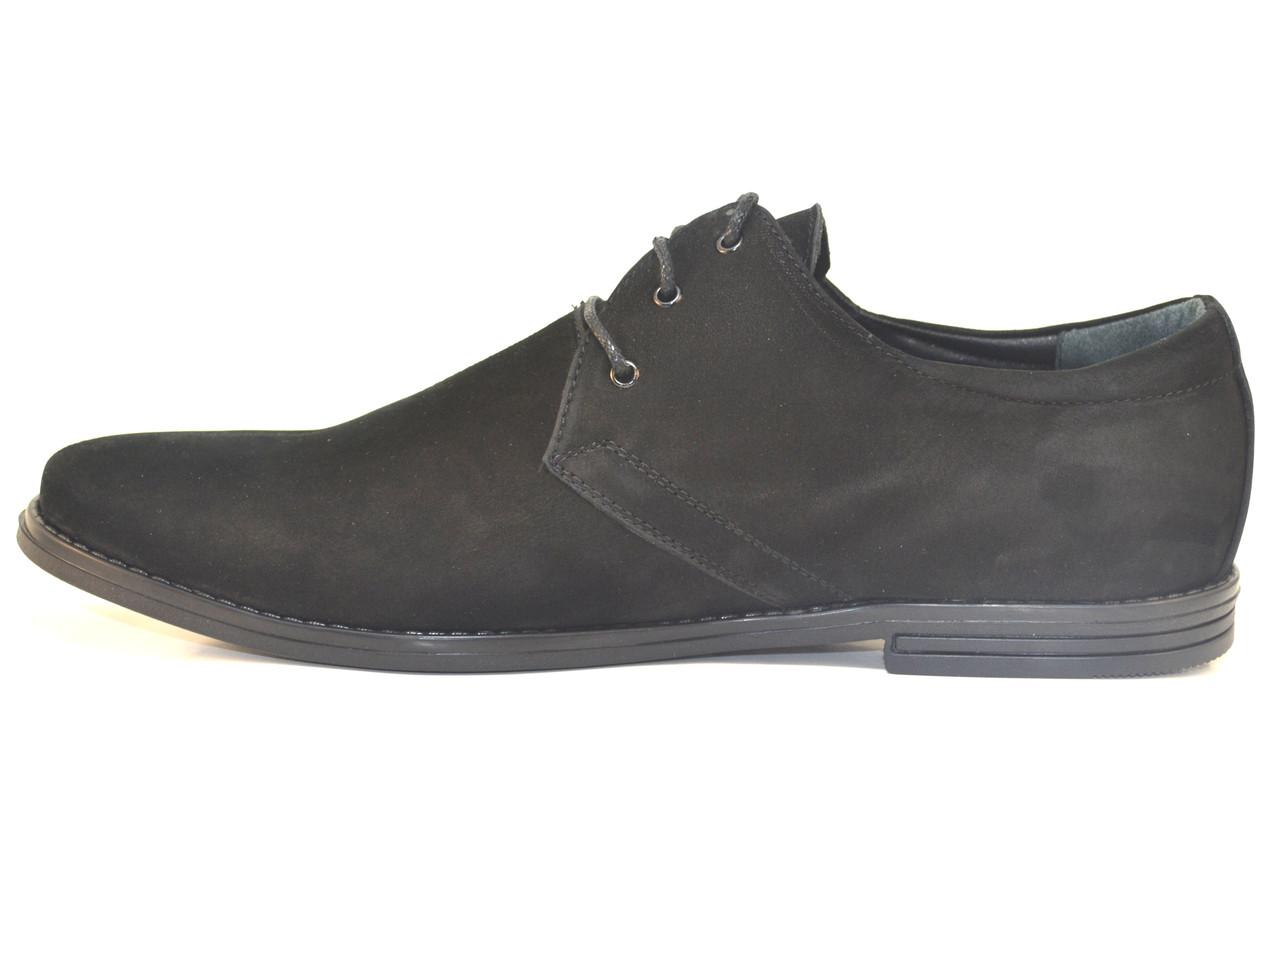 87f02850f ... Обувь большой размер мужской. Туфли кожаные нубук Rosso Avangard Carlo  Attraente Сamoscio Nero NUB, ...